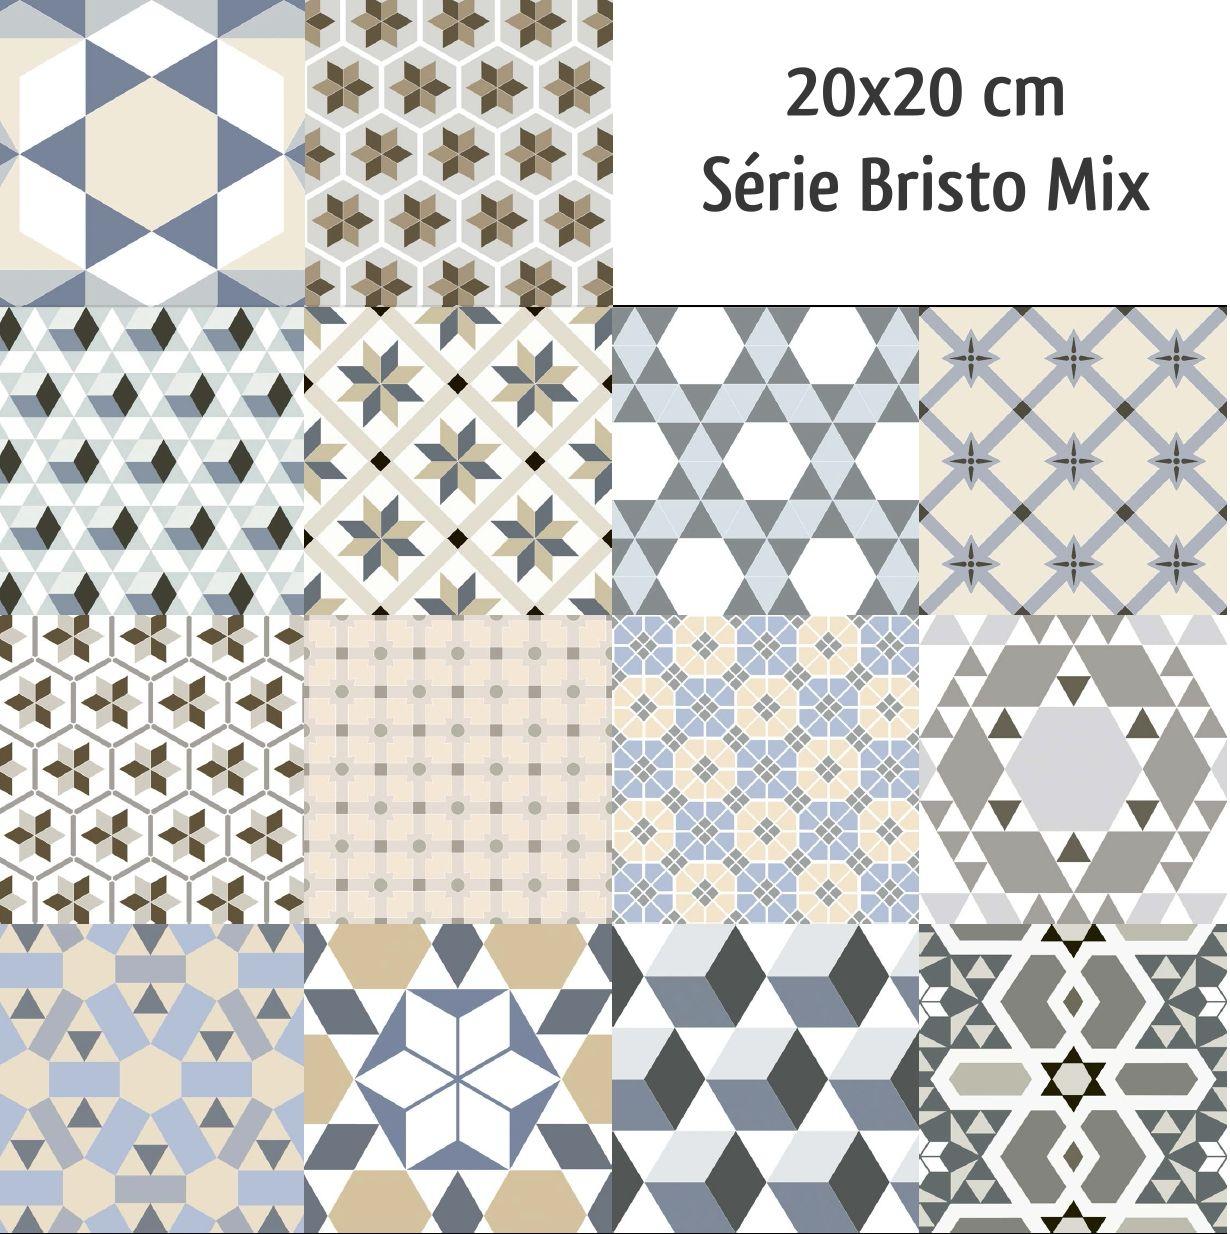 Carrelage Imitation Ciment Mix 20x20 Cm Bristo 1m Avec Carrelage Imitation Carreaux De Ciment Castorama Agencecormierdelauniere Com Agencecormierdelauniere Com